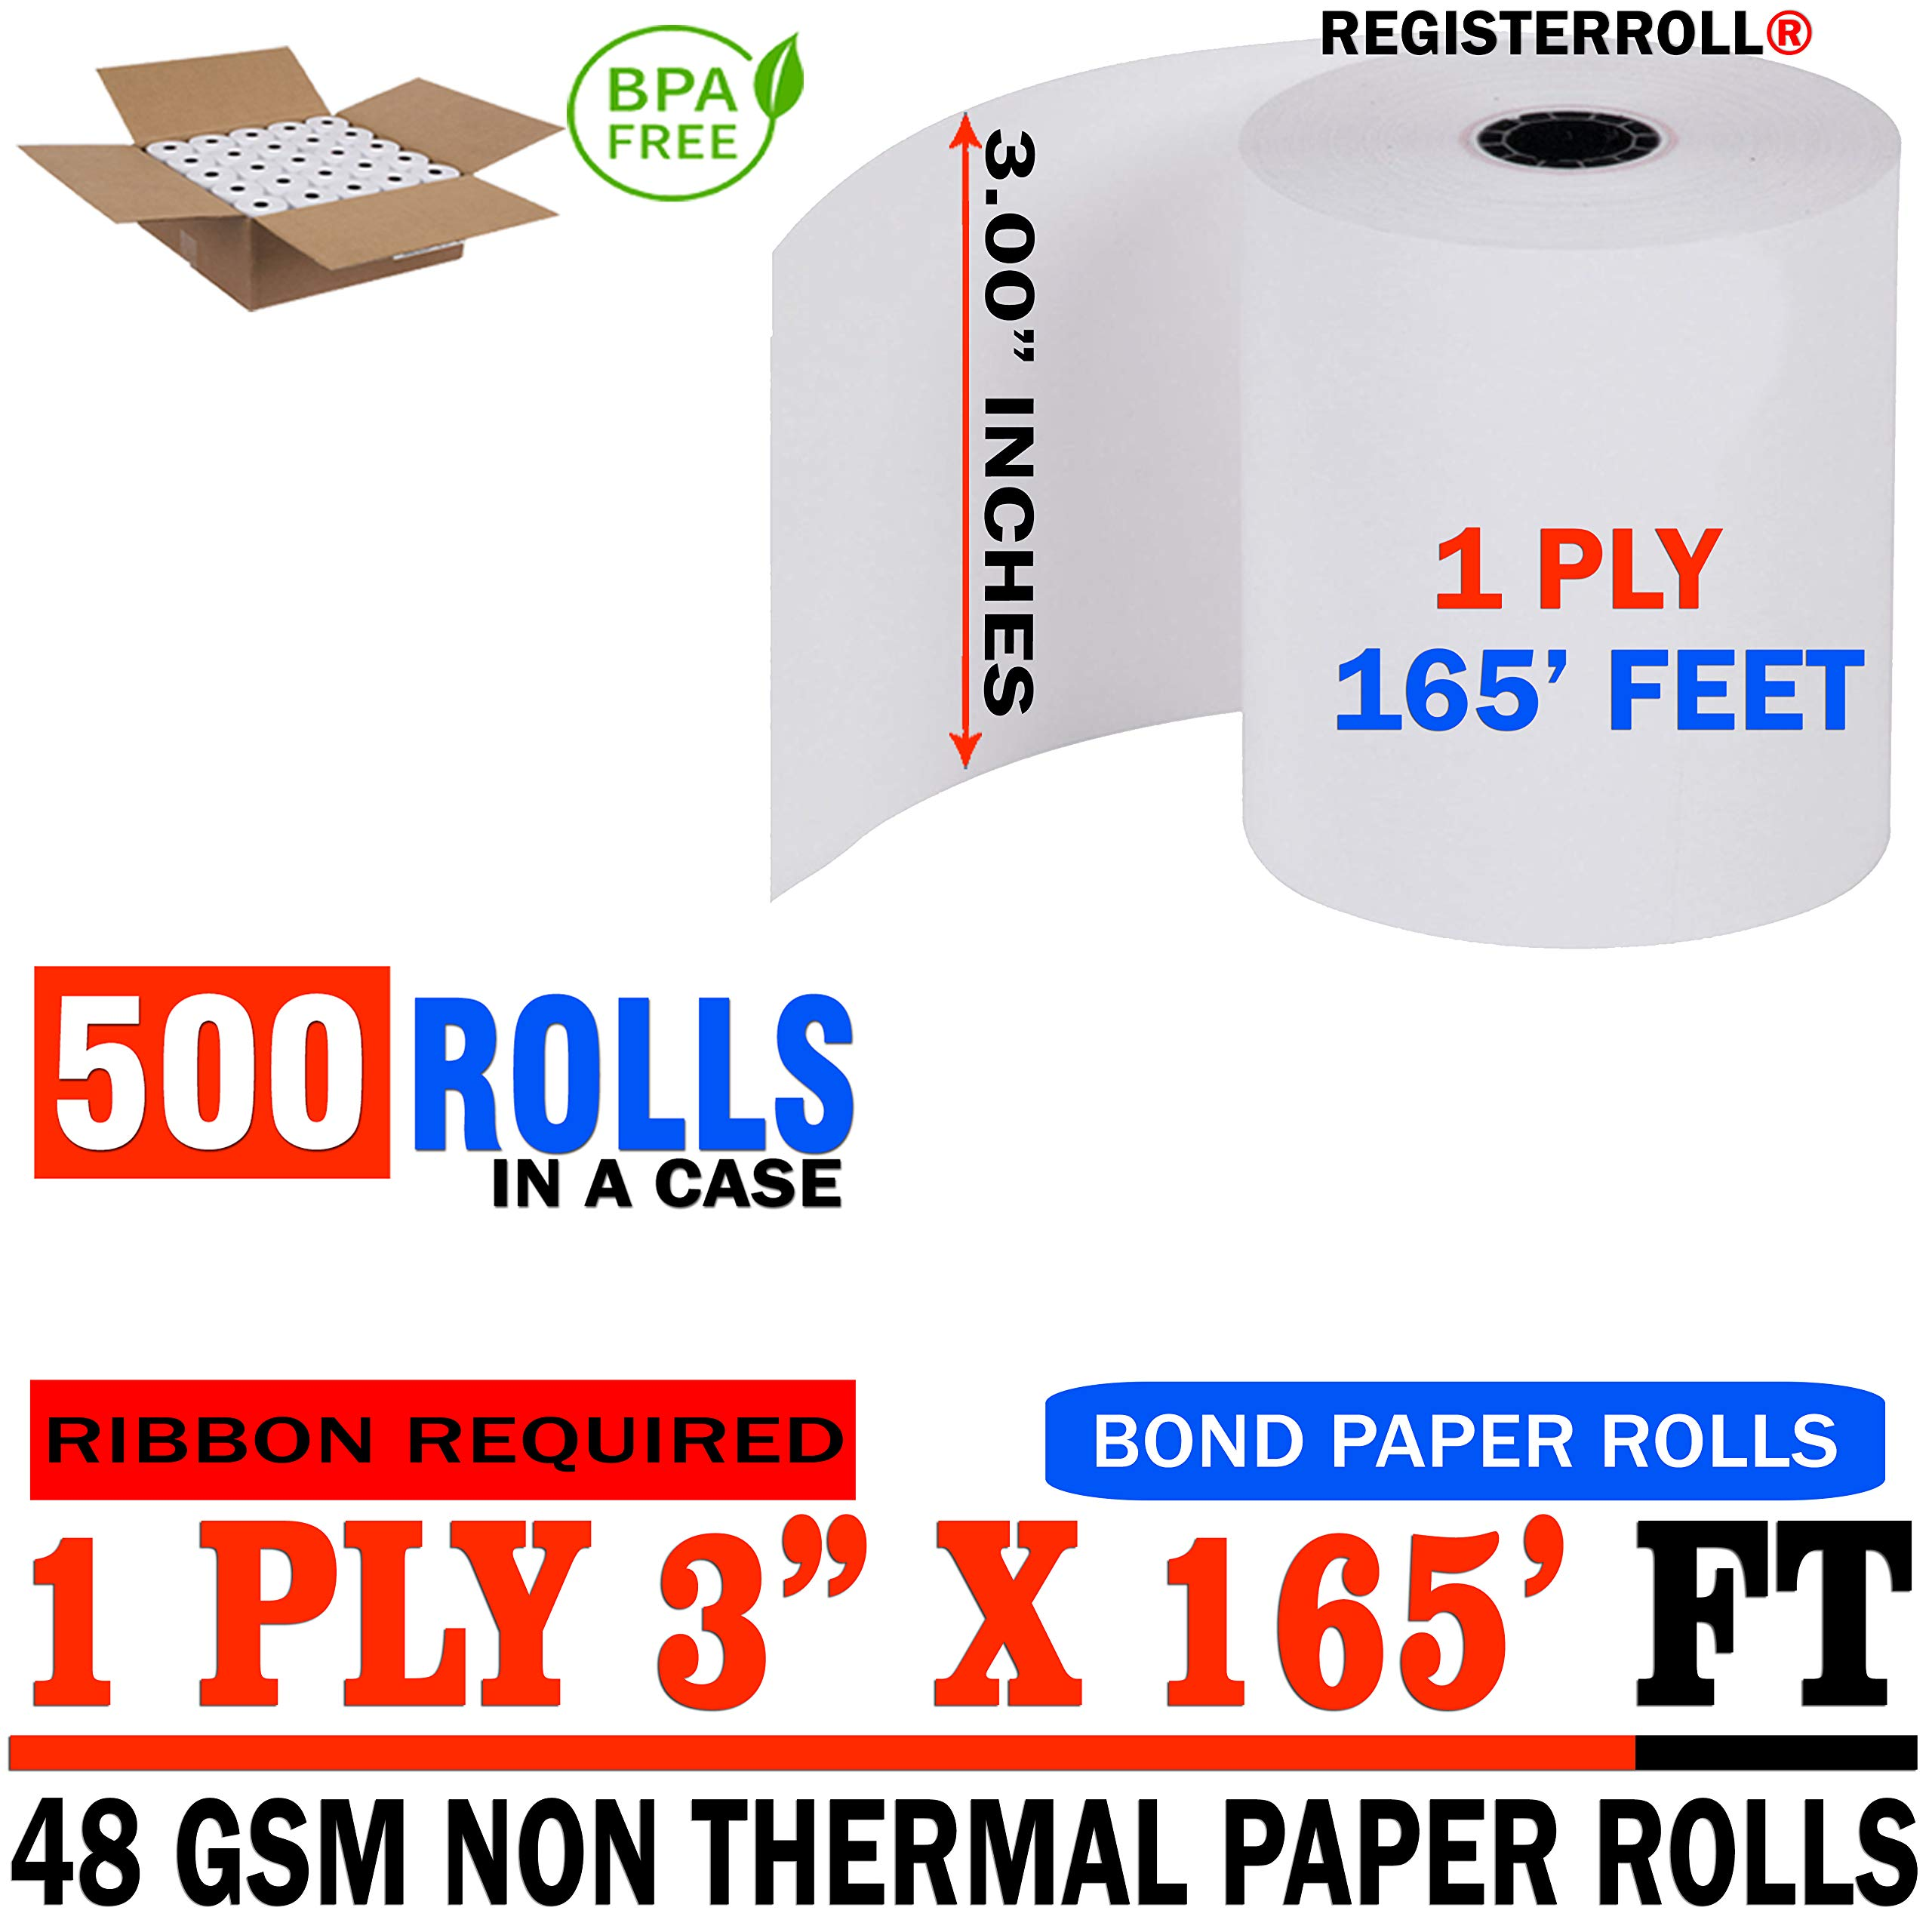 Star MICRONICS SP700 (All) 1-Ply 3 inch x 165' Paper 500 Rolls | MEGA Value Pack | from RegisterRoll